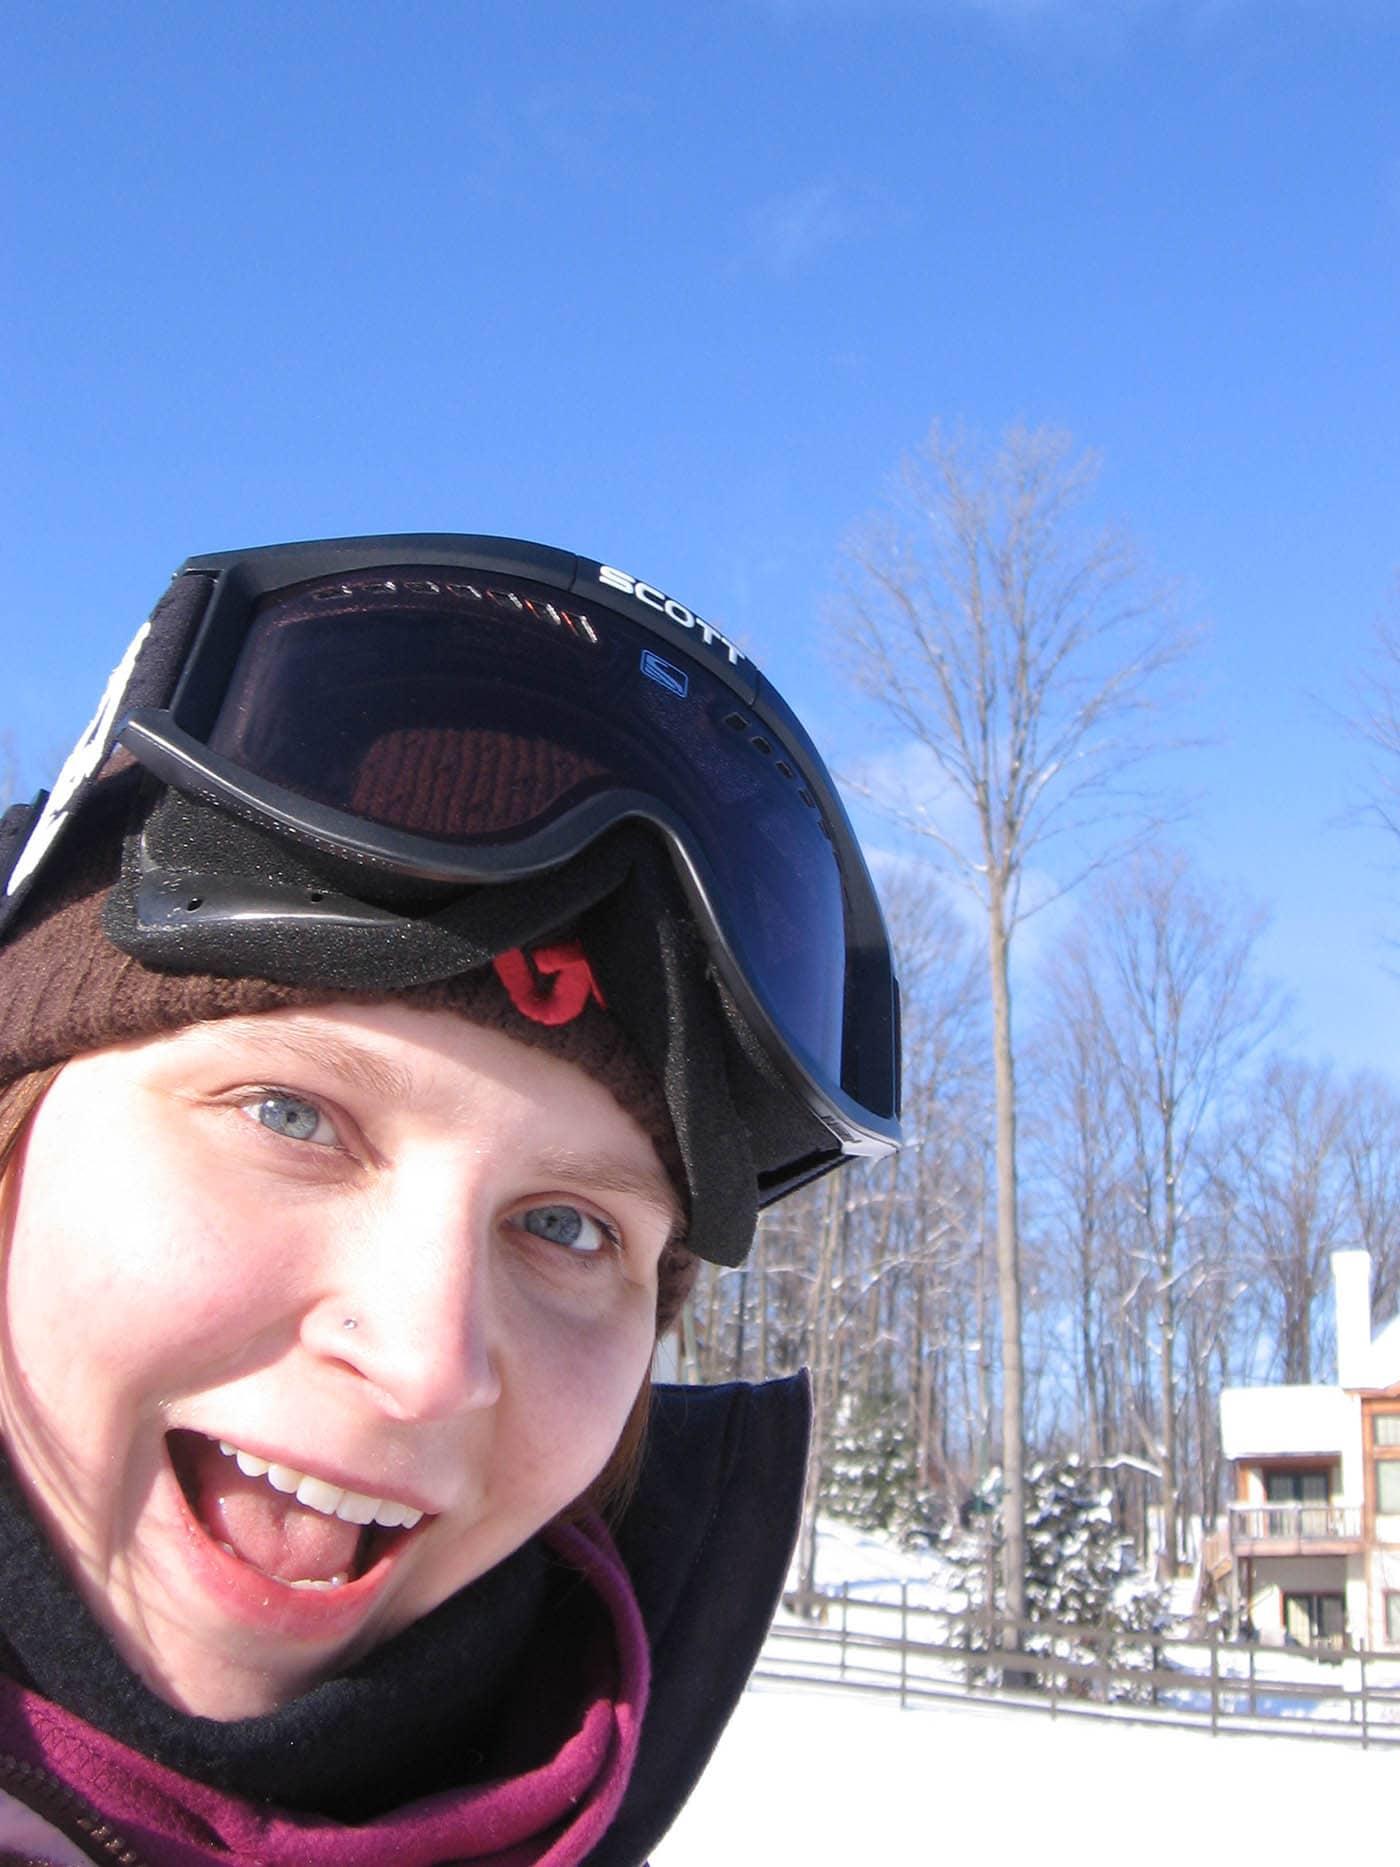 Selfie of me skiing on our Ski Trip in Petoskey, Michigan